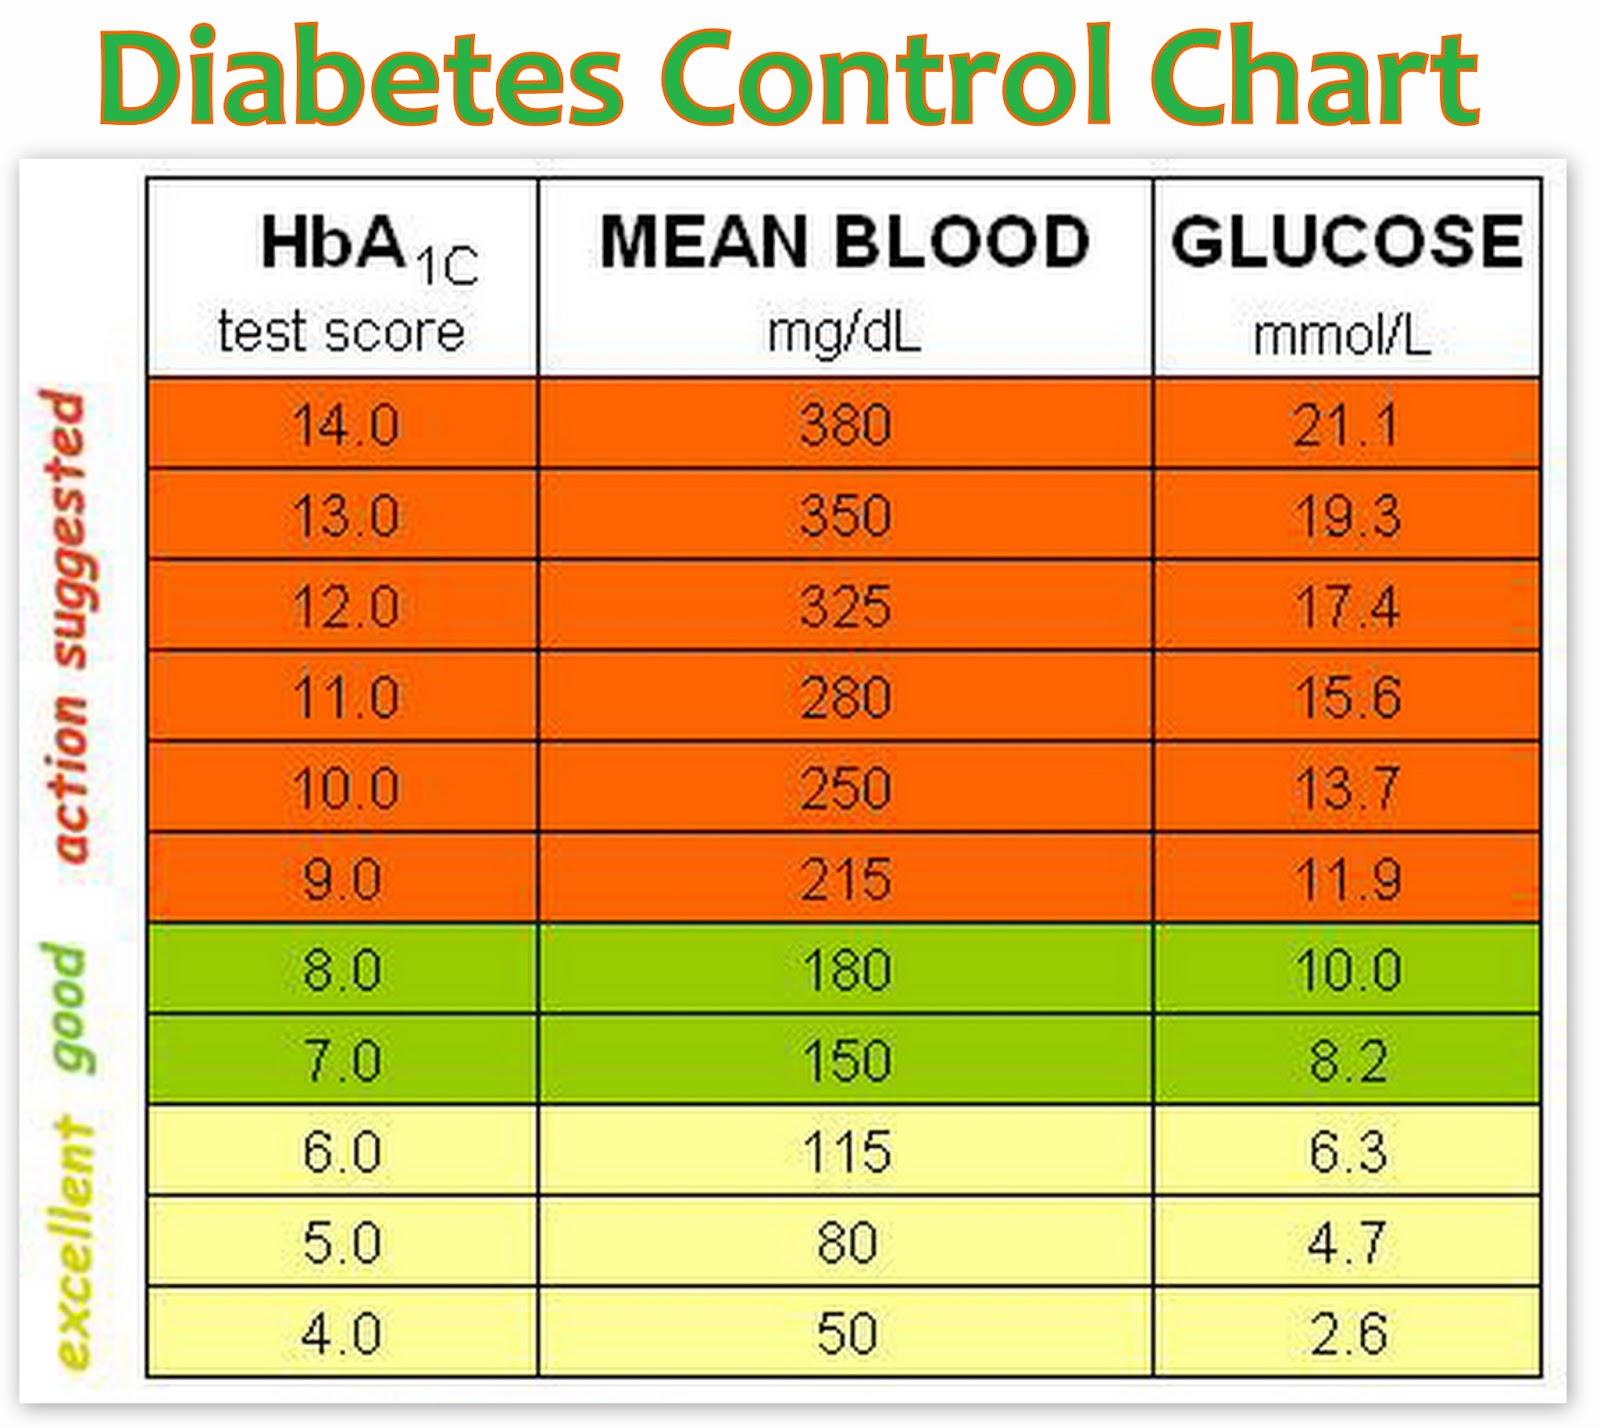 Hba1c conversion table glycaemic control brokeasshome diabetes chart fieldstation co nvjuhfo Choice Image